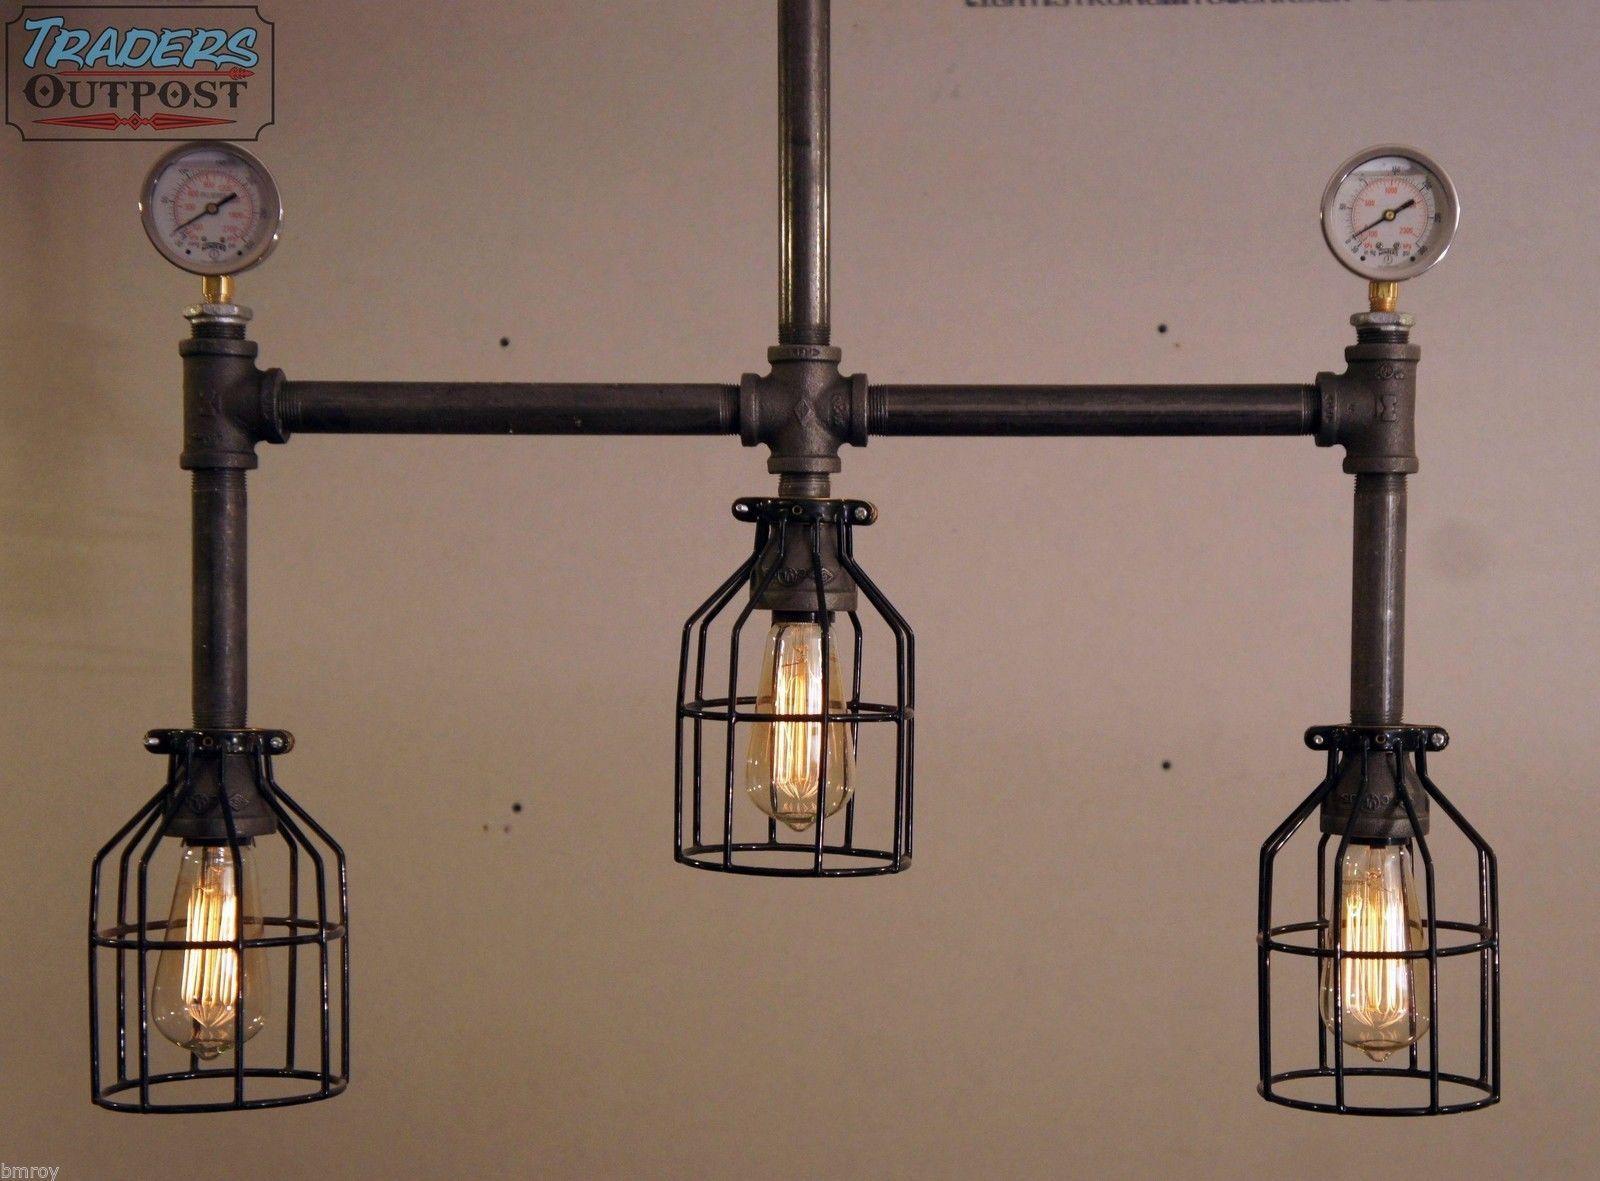 punk terraria table lamps steam chandelier diy steampunk octopus home looking lamp lighting good vintage solar design system floor